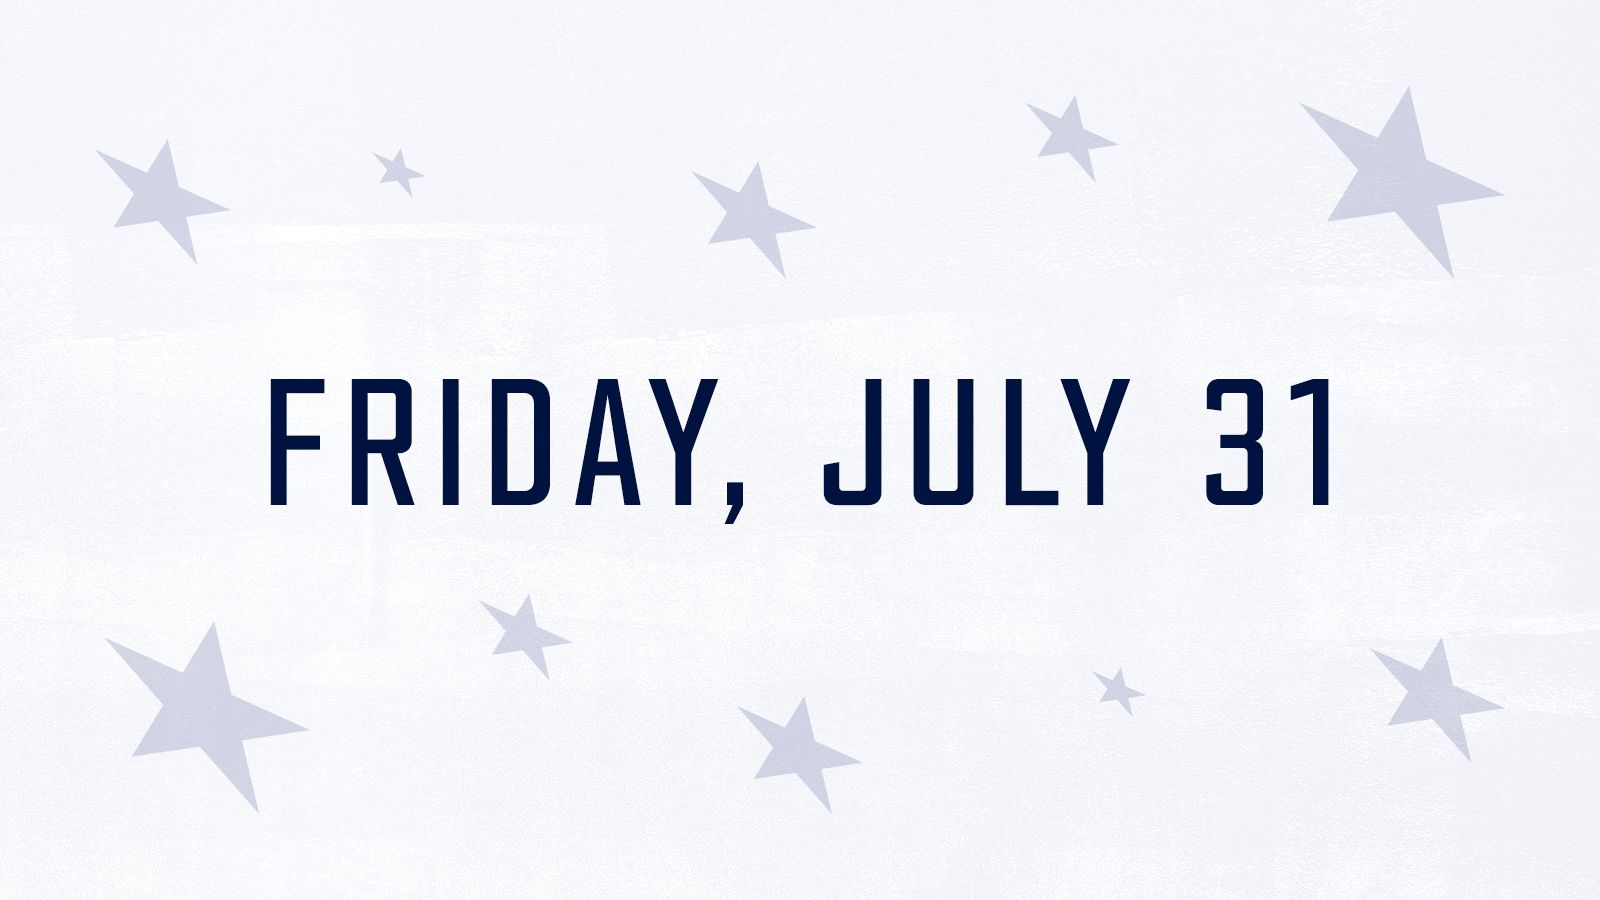 Friday, July 31